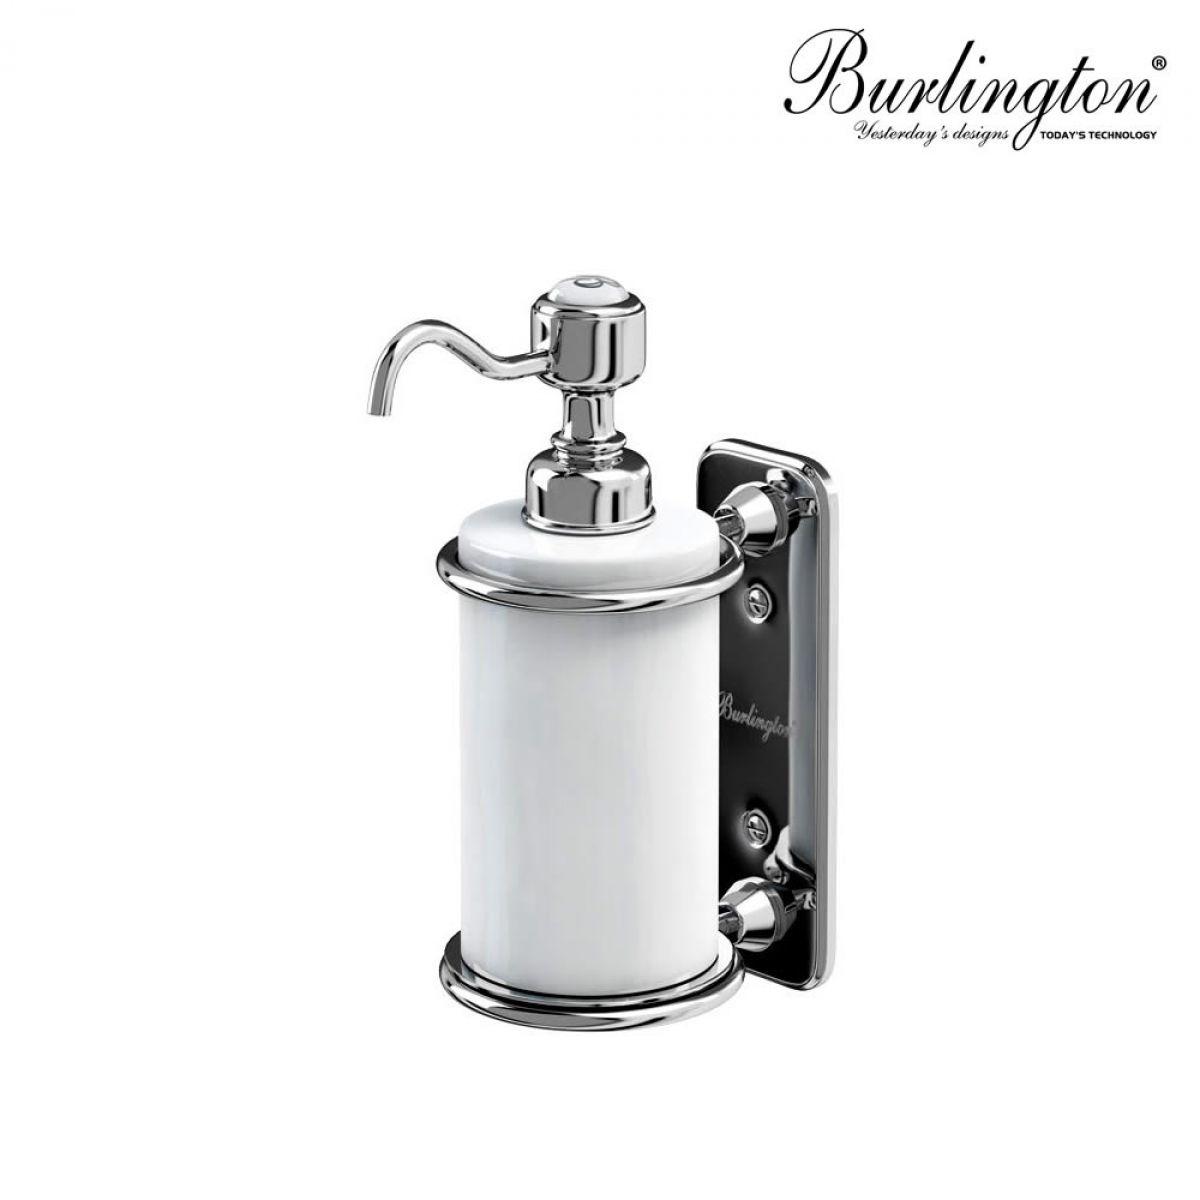 Burlington Traditional Wall Mounted Liquid Soap Dispenser